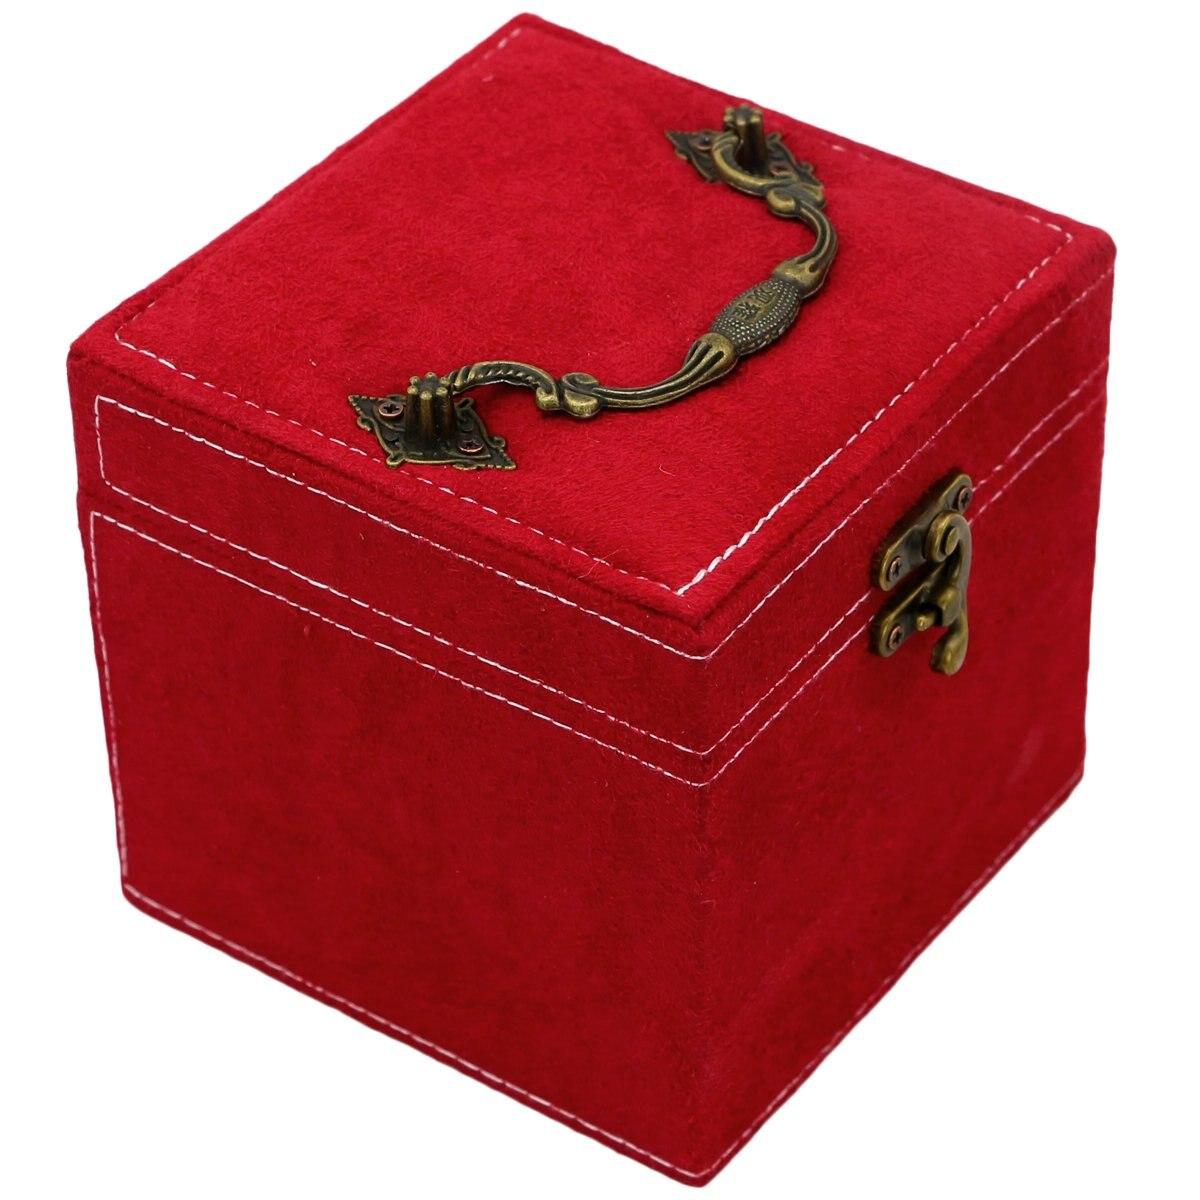 Retro Jewelry Box Case Storage Organizer Makeup Case With Lock - Red